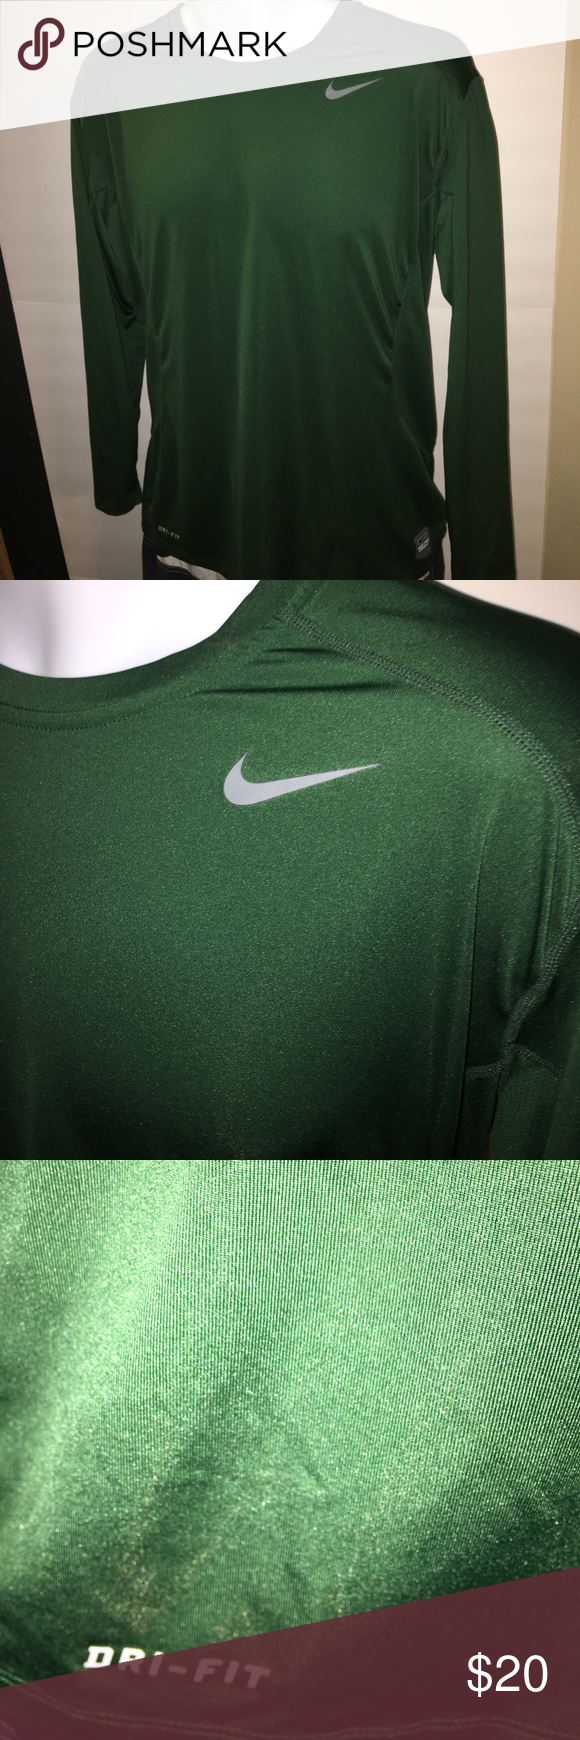 Nike Pro Combat Green Long Sleeved Shirt Nike Pro Combat Green Long Sleeved Shirt Like New Men S Size Large Nike Long Sleeve Shirts Nike Pro Combat Nike Pros [ 1740 x 580 Pixel ]